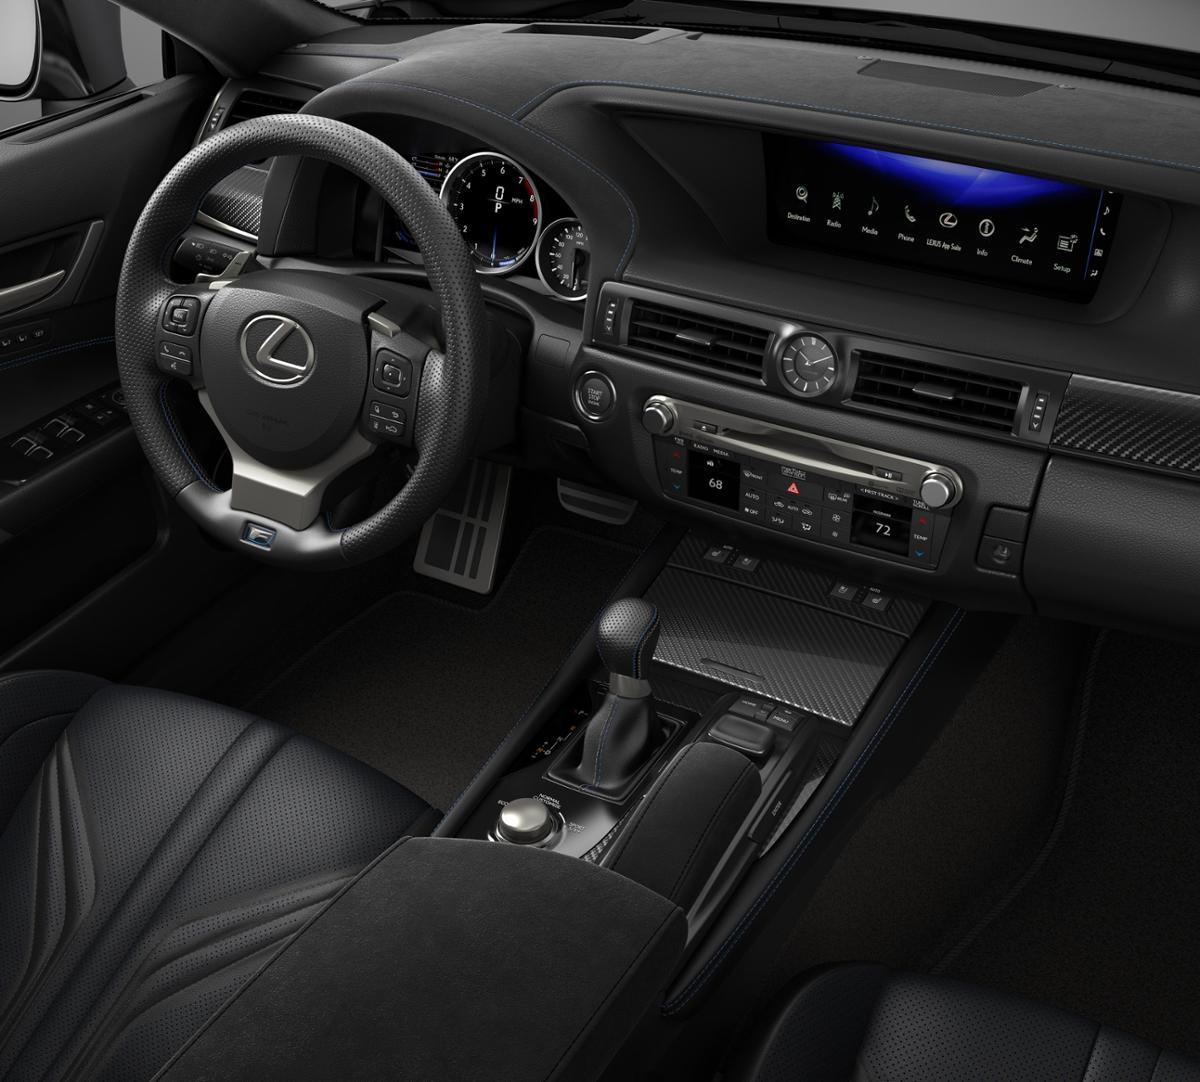 Lexus Gs Lease Deals: BUTLER LEXUS OF SOUTH